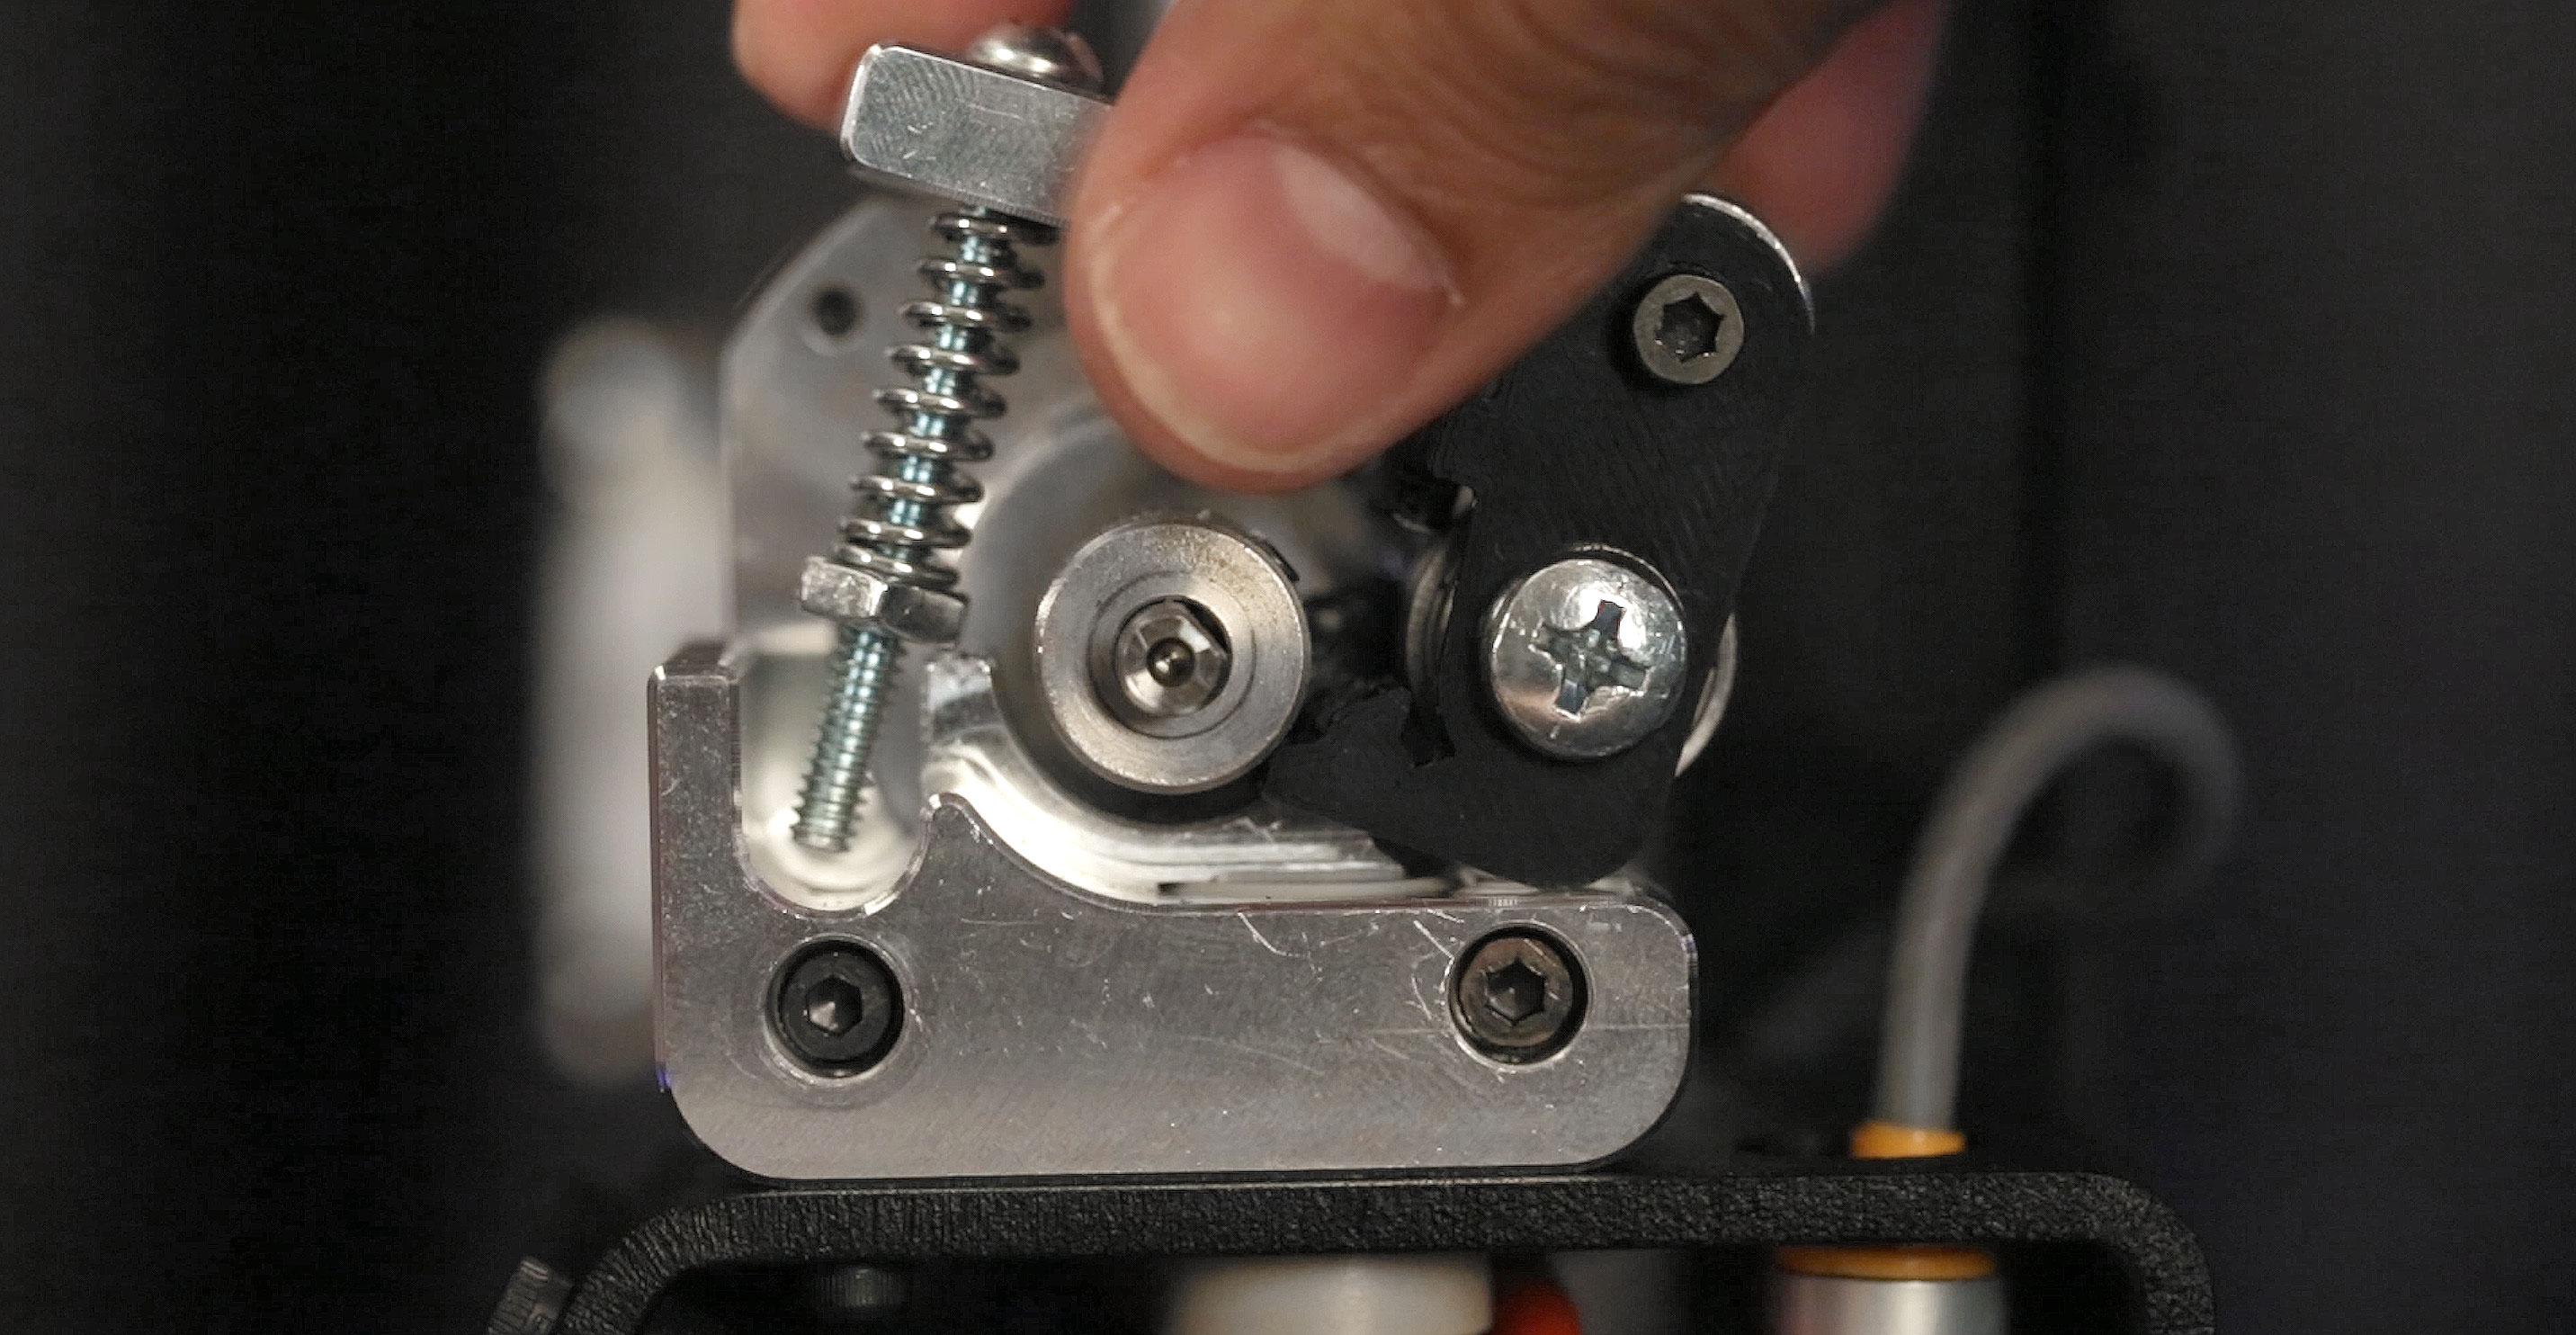 3d_printing_align-screw-to-heat-block.jpg